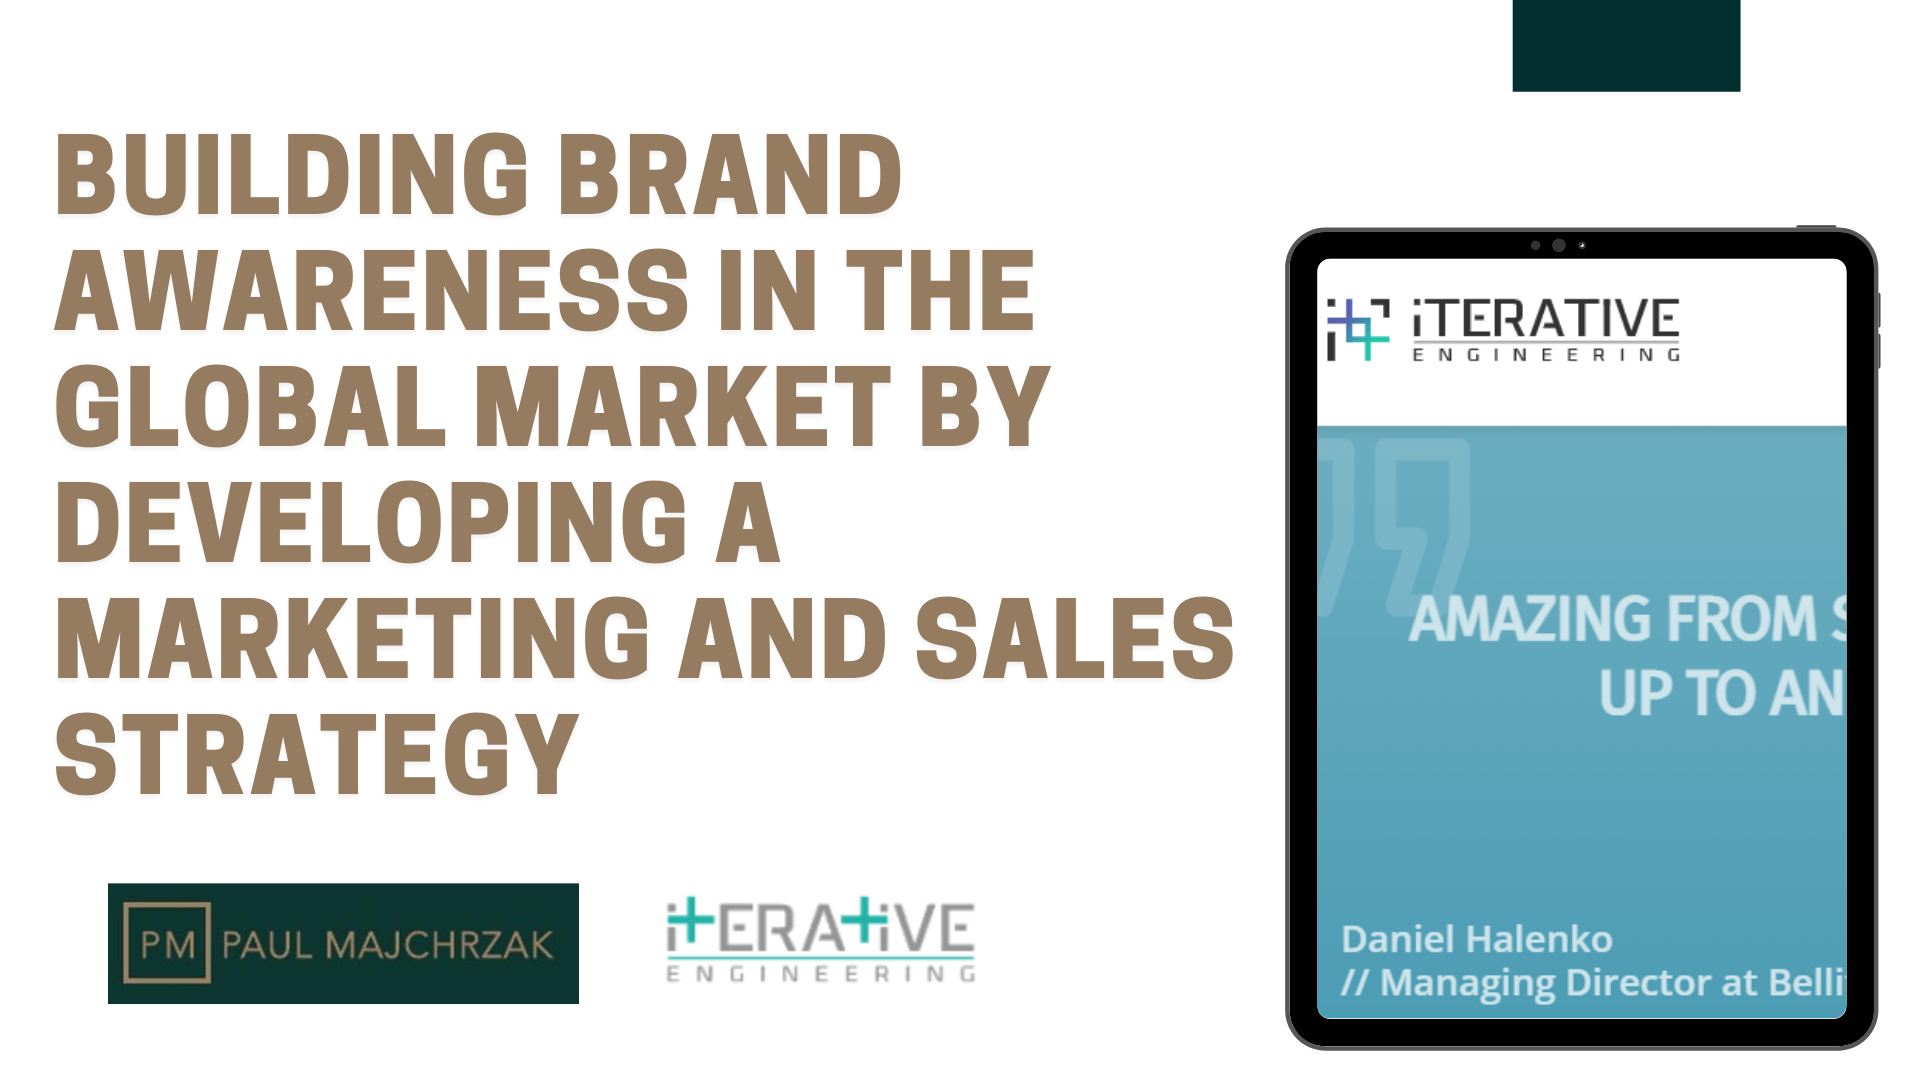 Building brand awareness in the global market. - Branding & Positioning